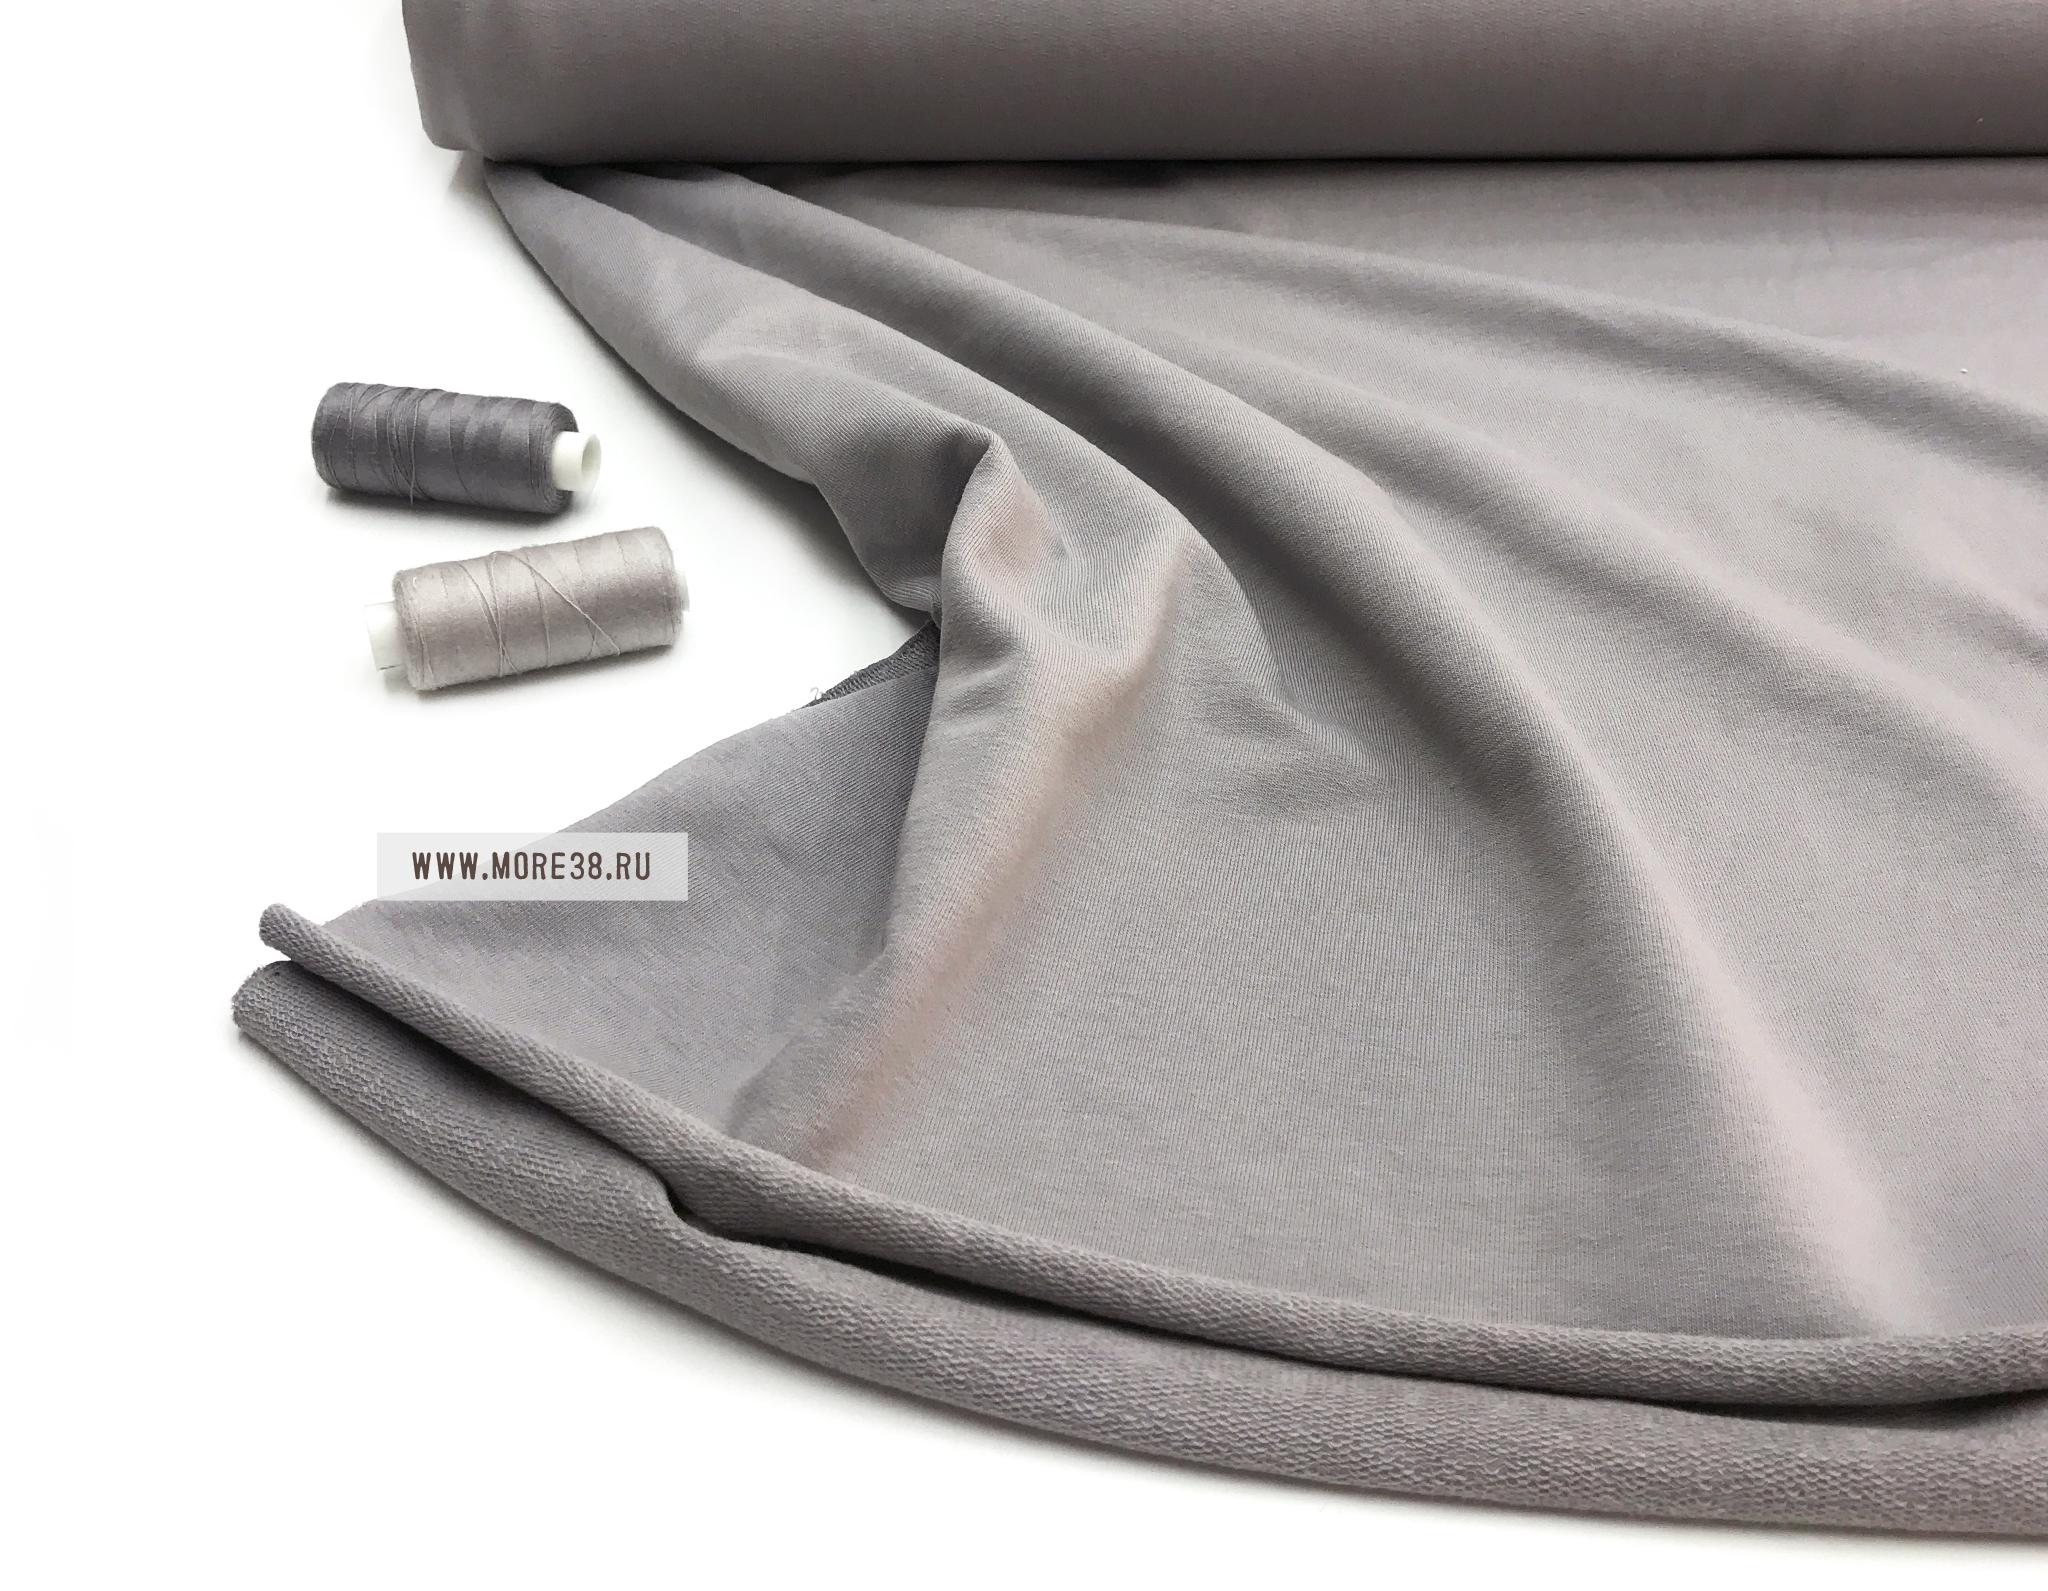 Футер 2х нитка петля, серый графит ,240 гр